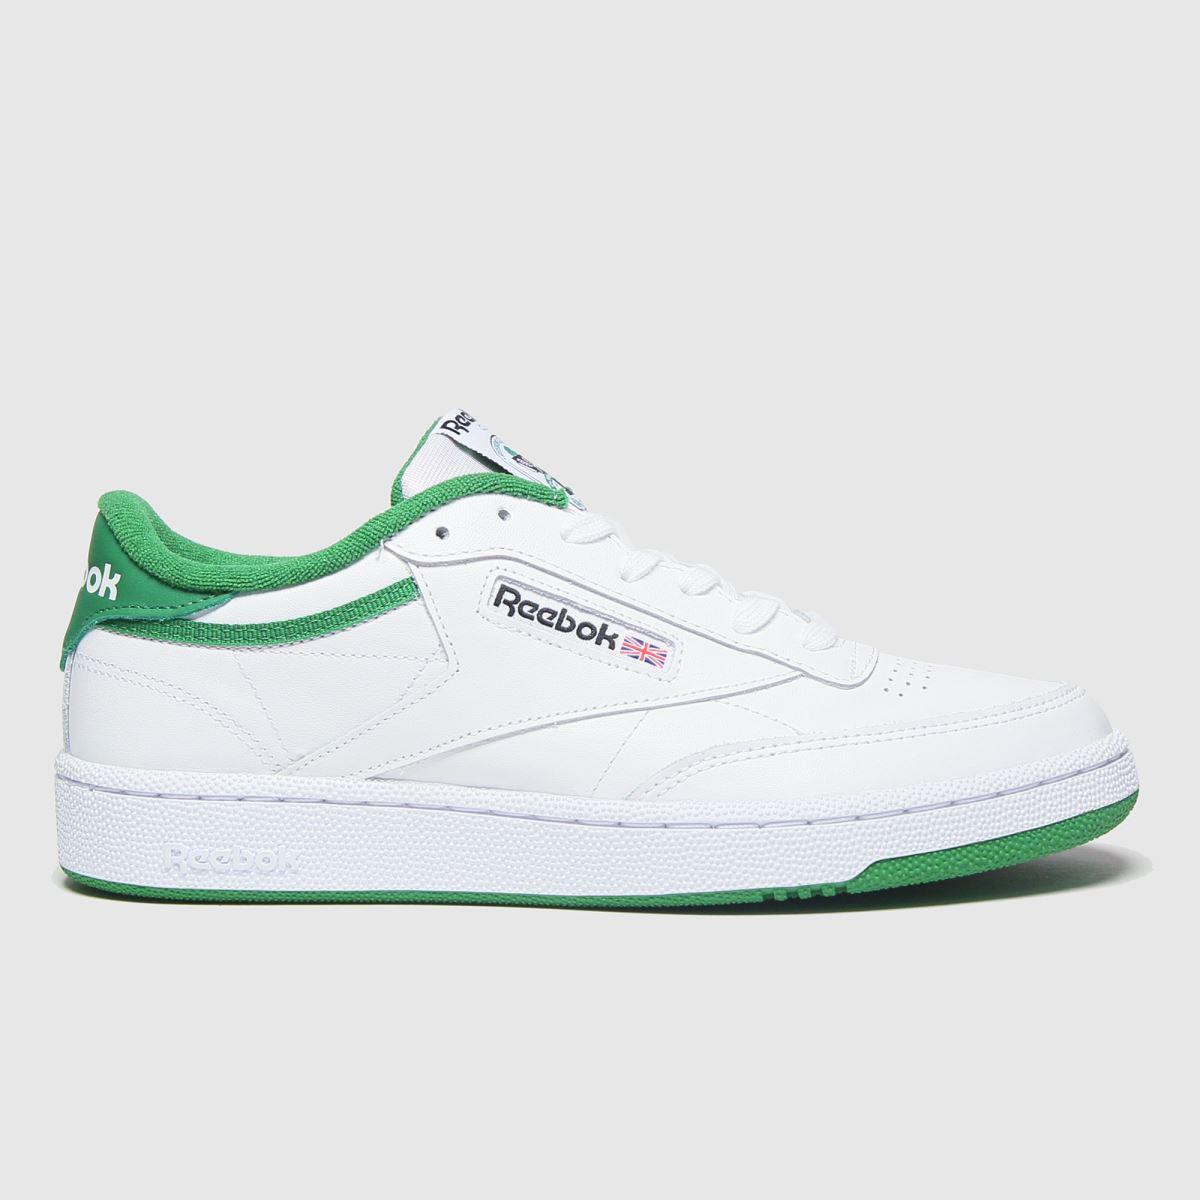 Reebok White & Green Club C 85 Trainers